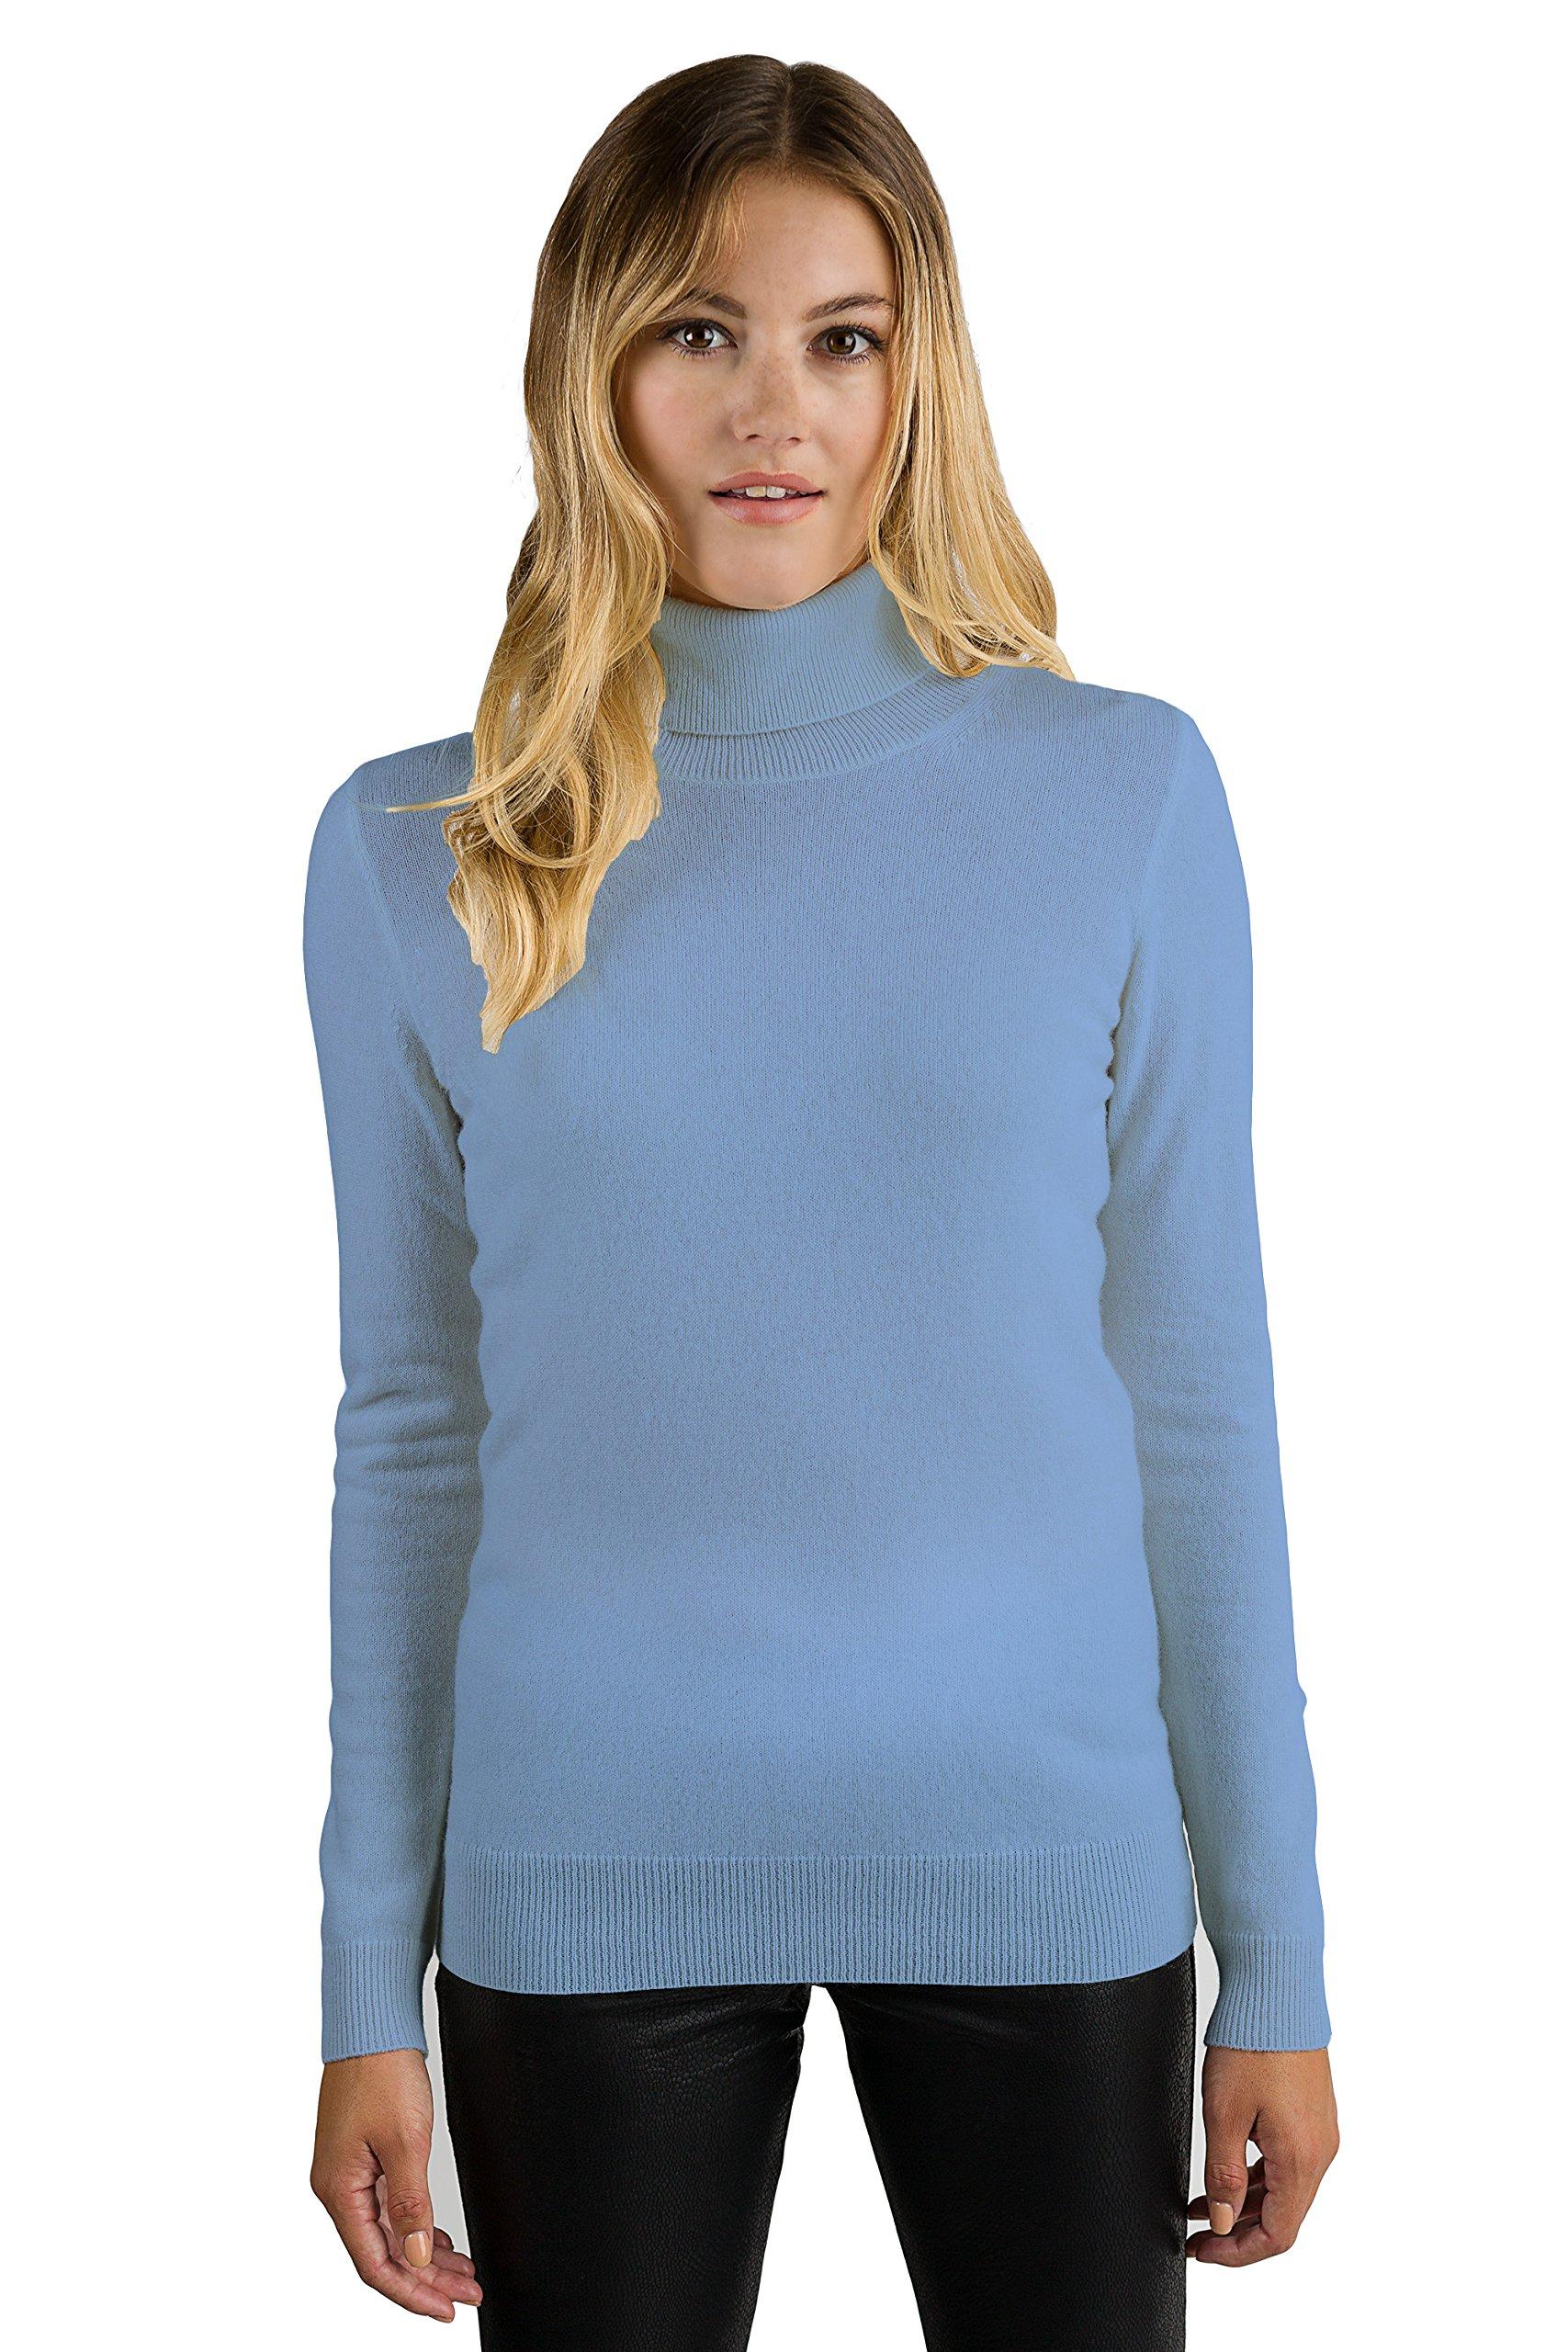 JENNIE LIU Women's 100% Pure Cashmere Long Sleeve Pullover Turtleneck Sweater (S, CrystalBlue)